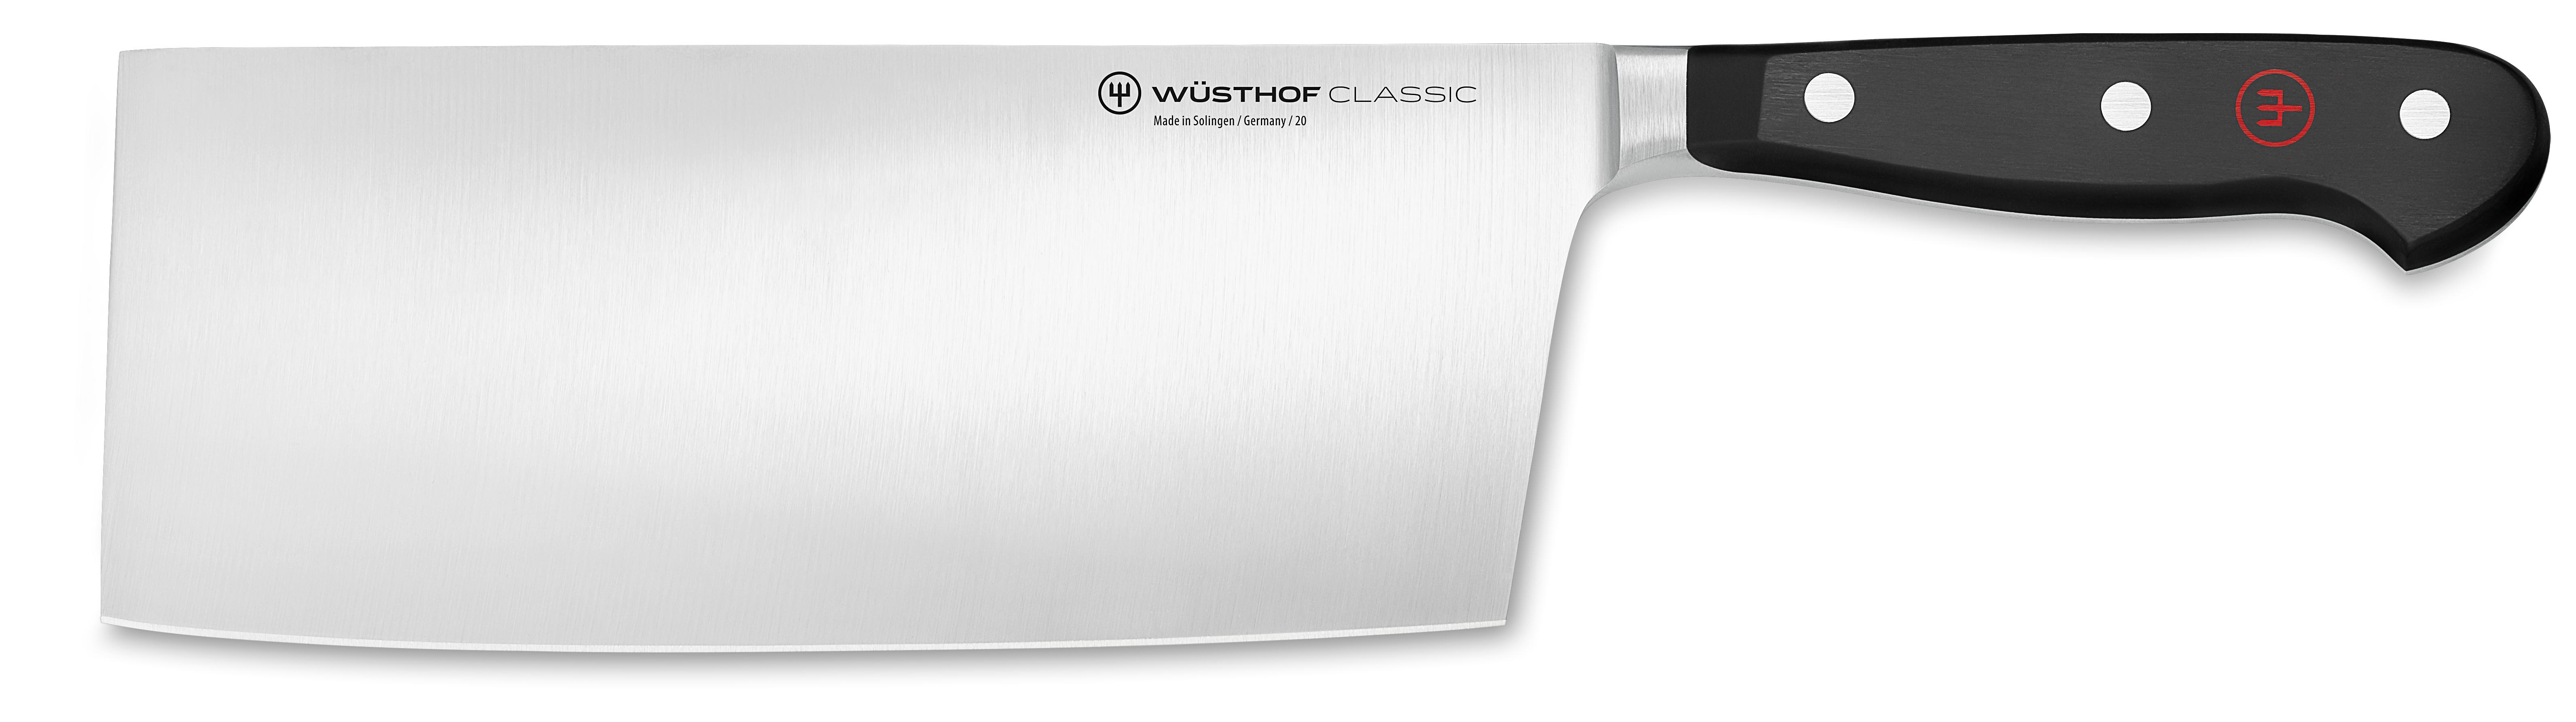 Chinesisches Kochmesser / Chinese chef's knife